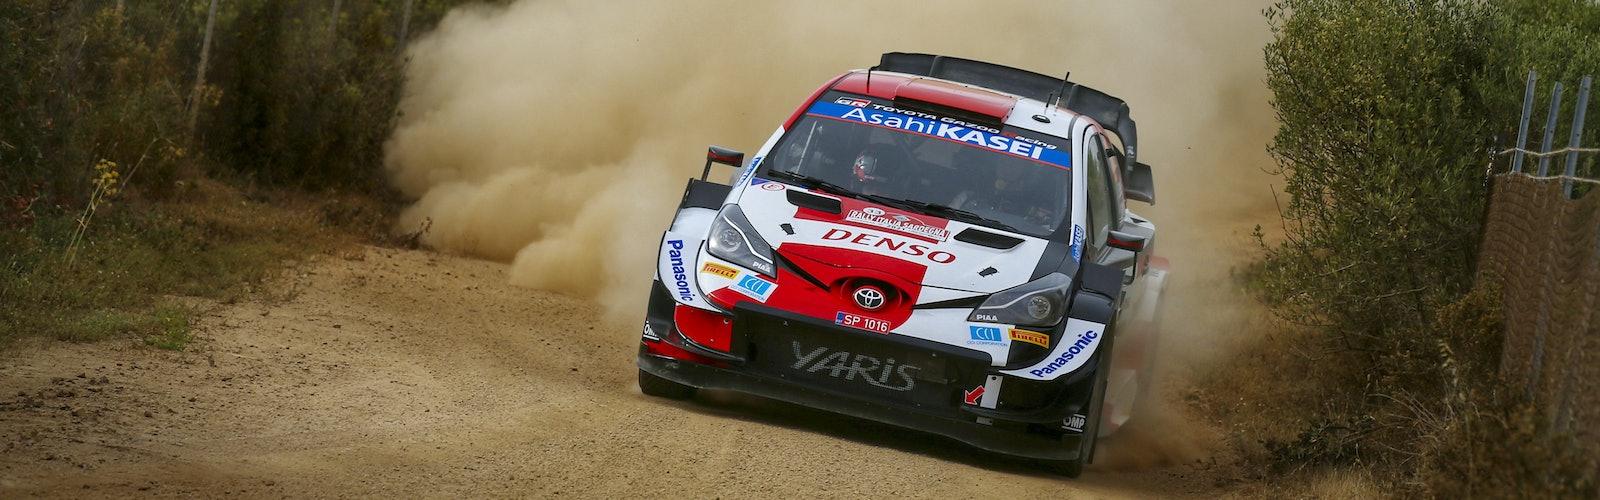 WRC_2021_Rd.5_270